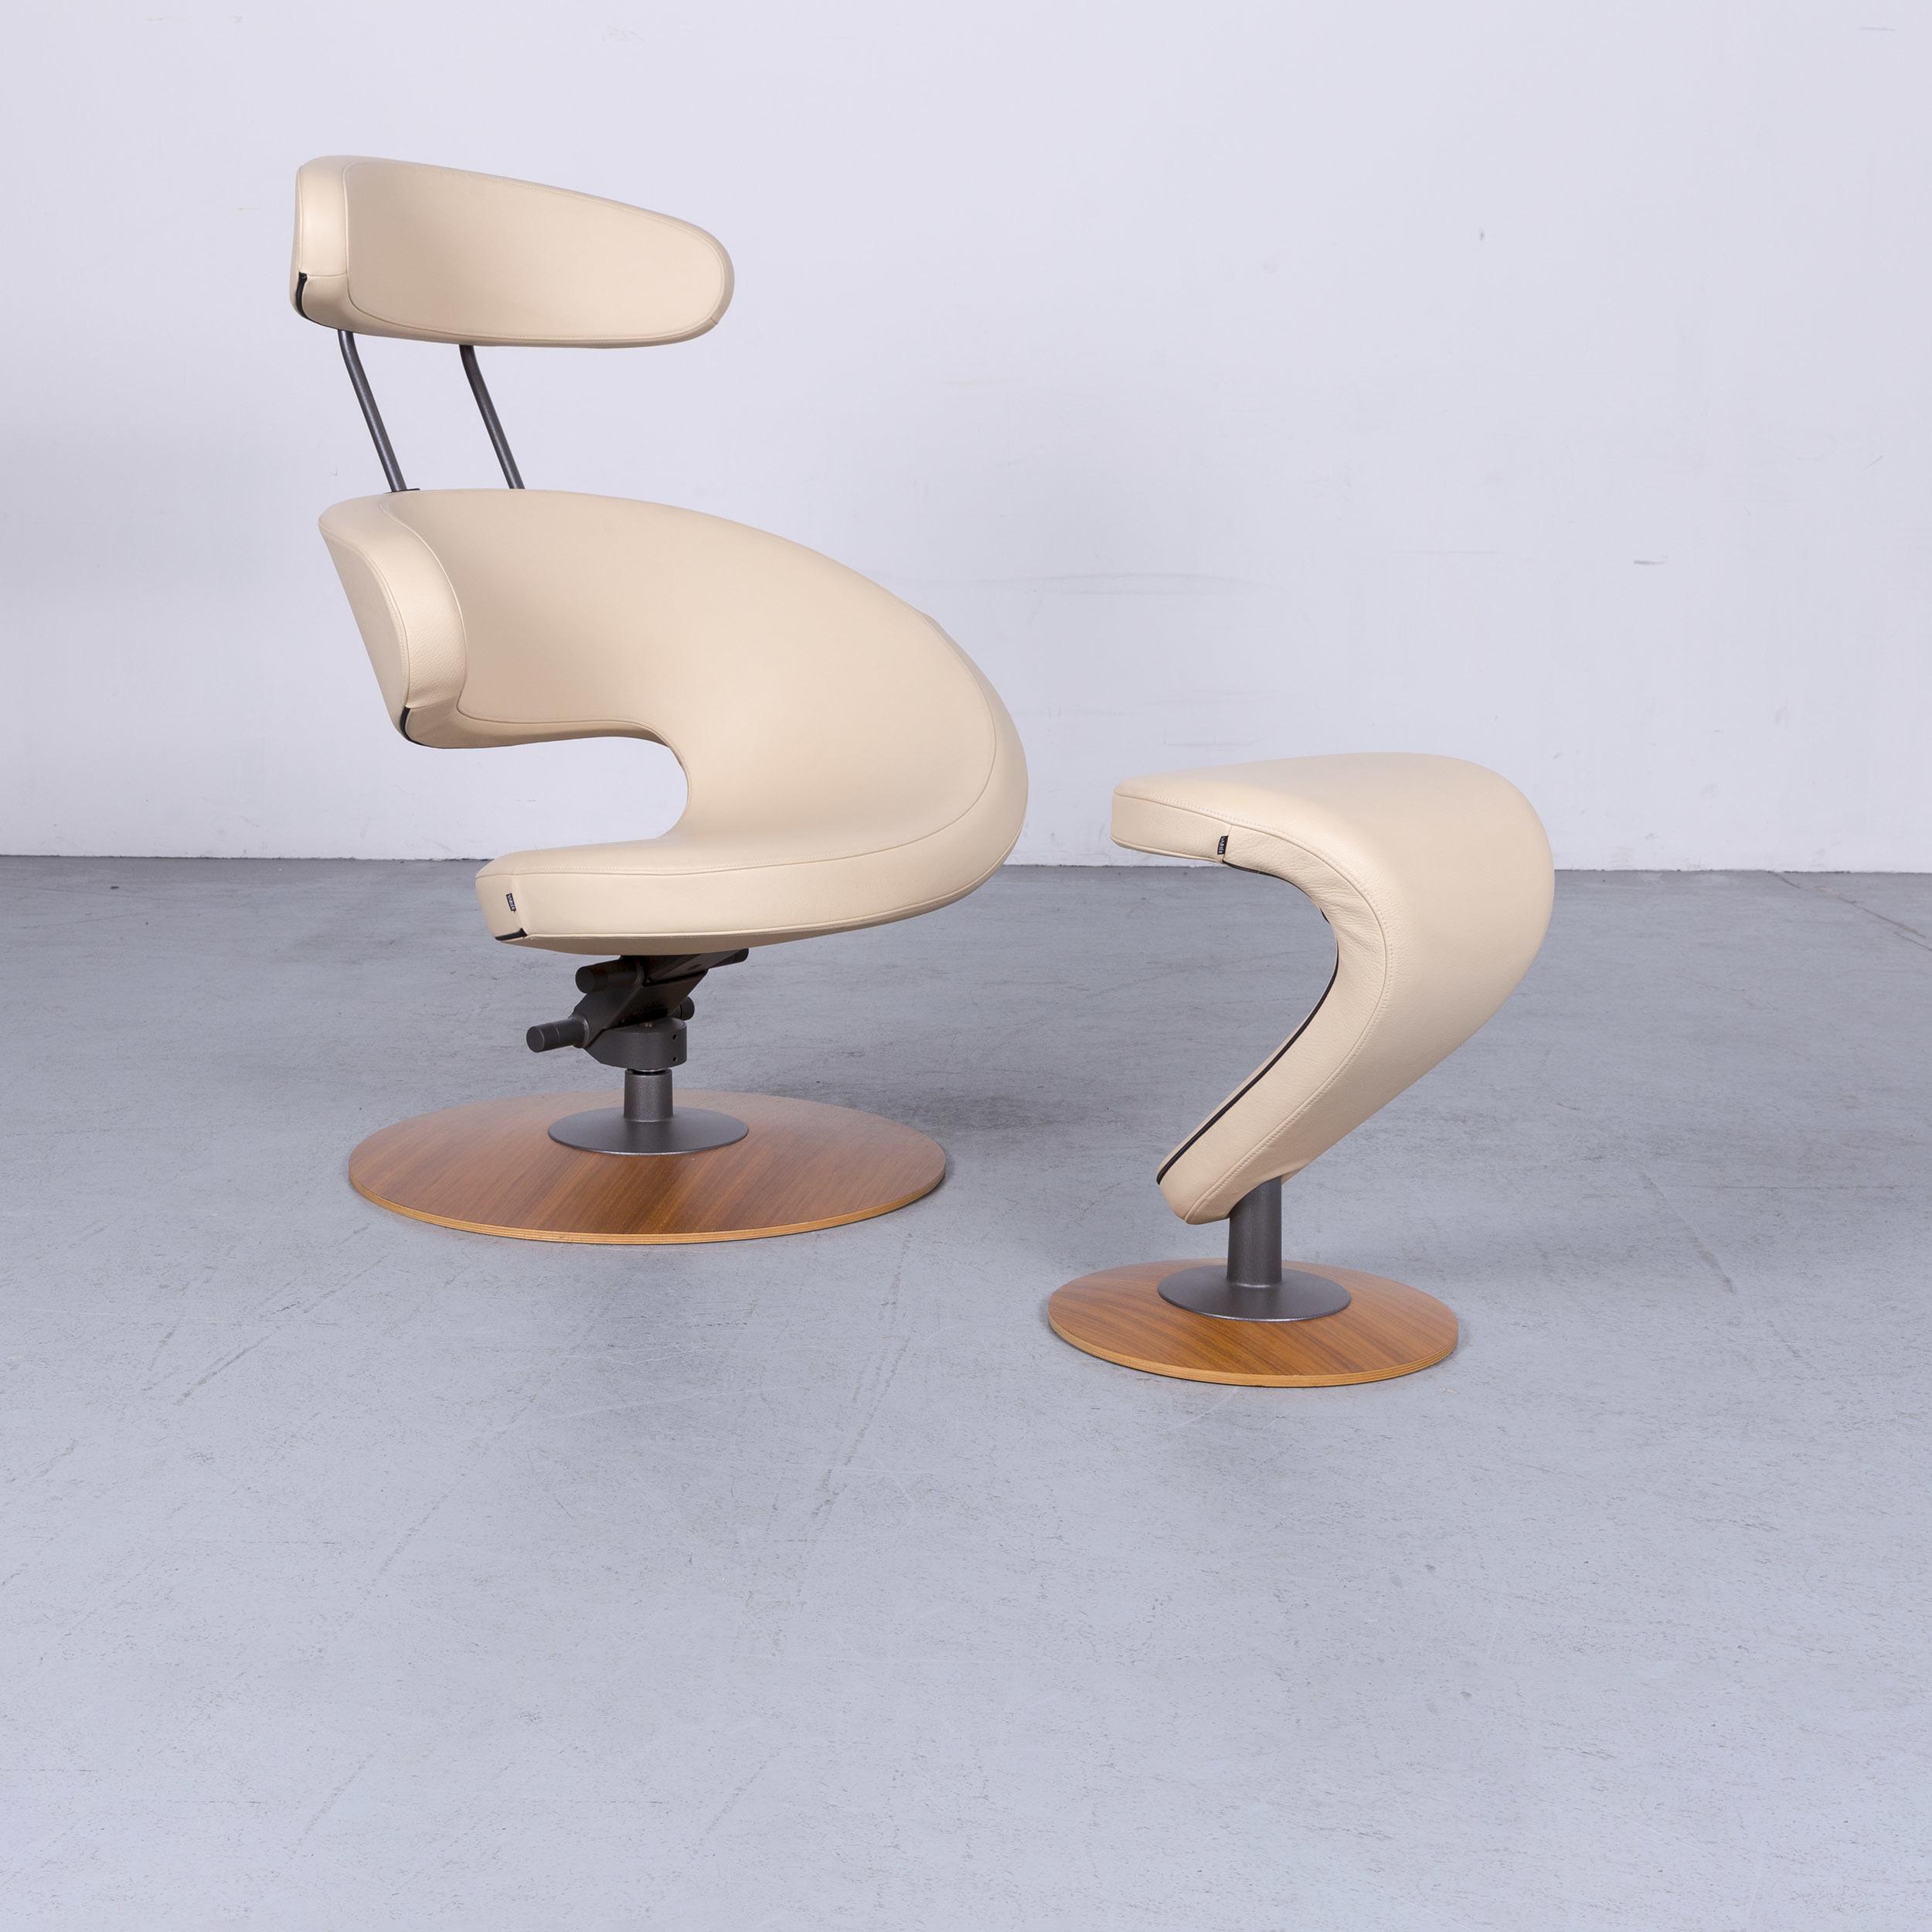 Poltrona Varier Peel.Varier Peel Designer Leather Armchair Stool Beige Genuine Leather Chair 6436